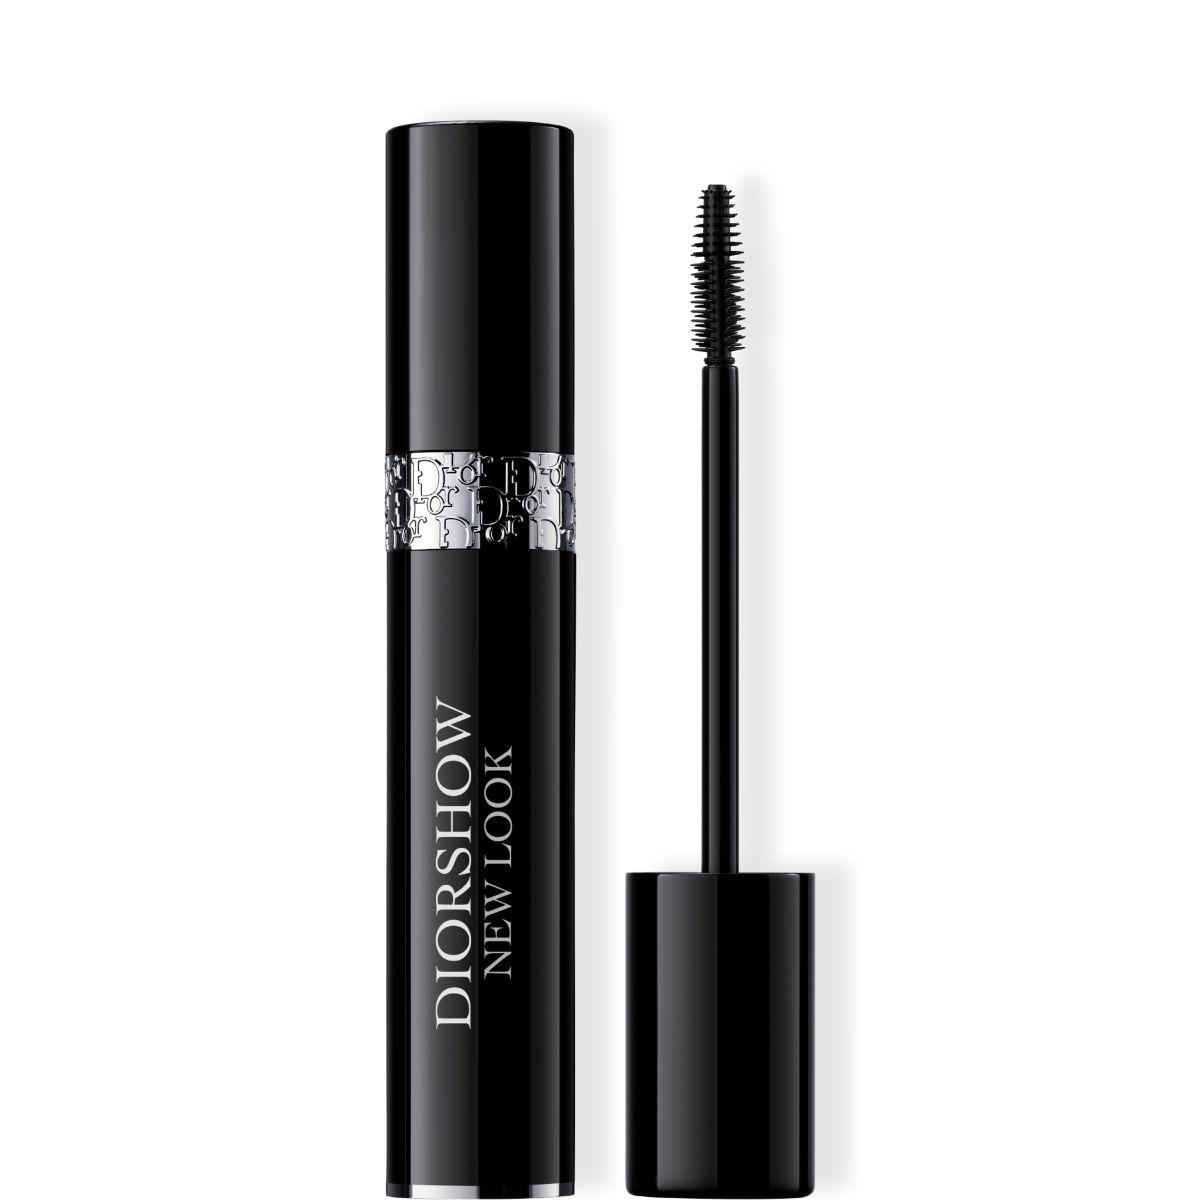 Dior - Diorshow New Look - Mascara volume multi-dimensionnel & soin